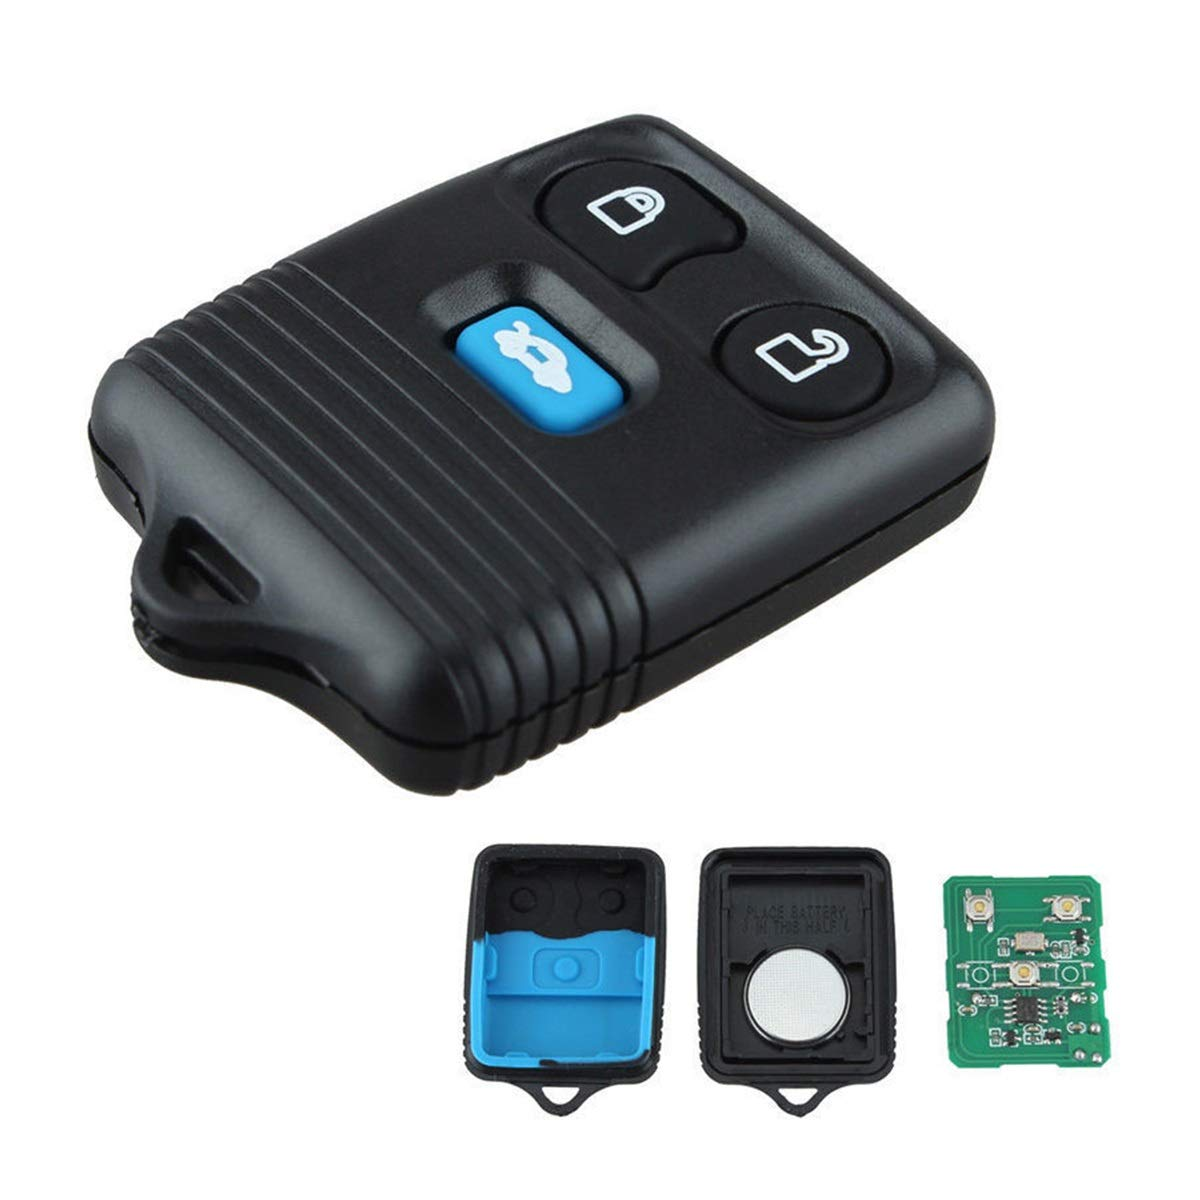 DEALPEAK 433MHz Programming Car Remote Key FOB Transmitter 3 Button Keyless Entry Remote Control Key Fob Fit to Ford Transit Mk6 2000-2006